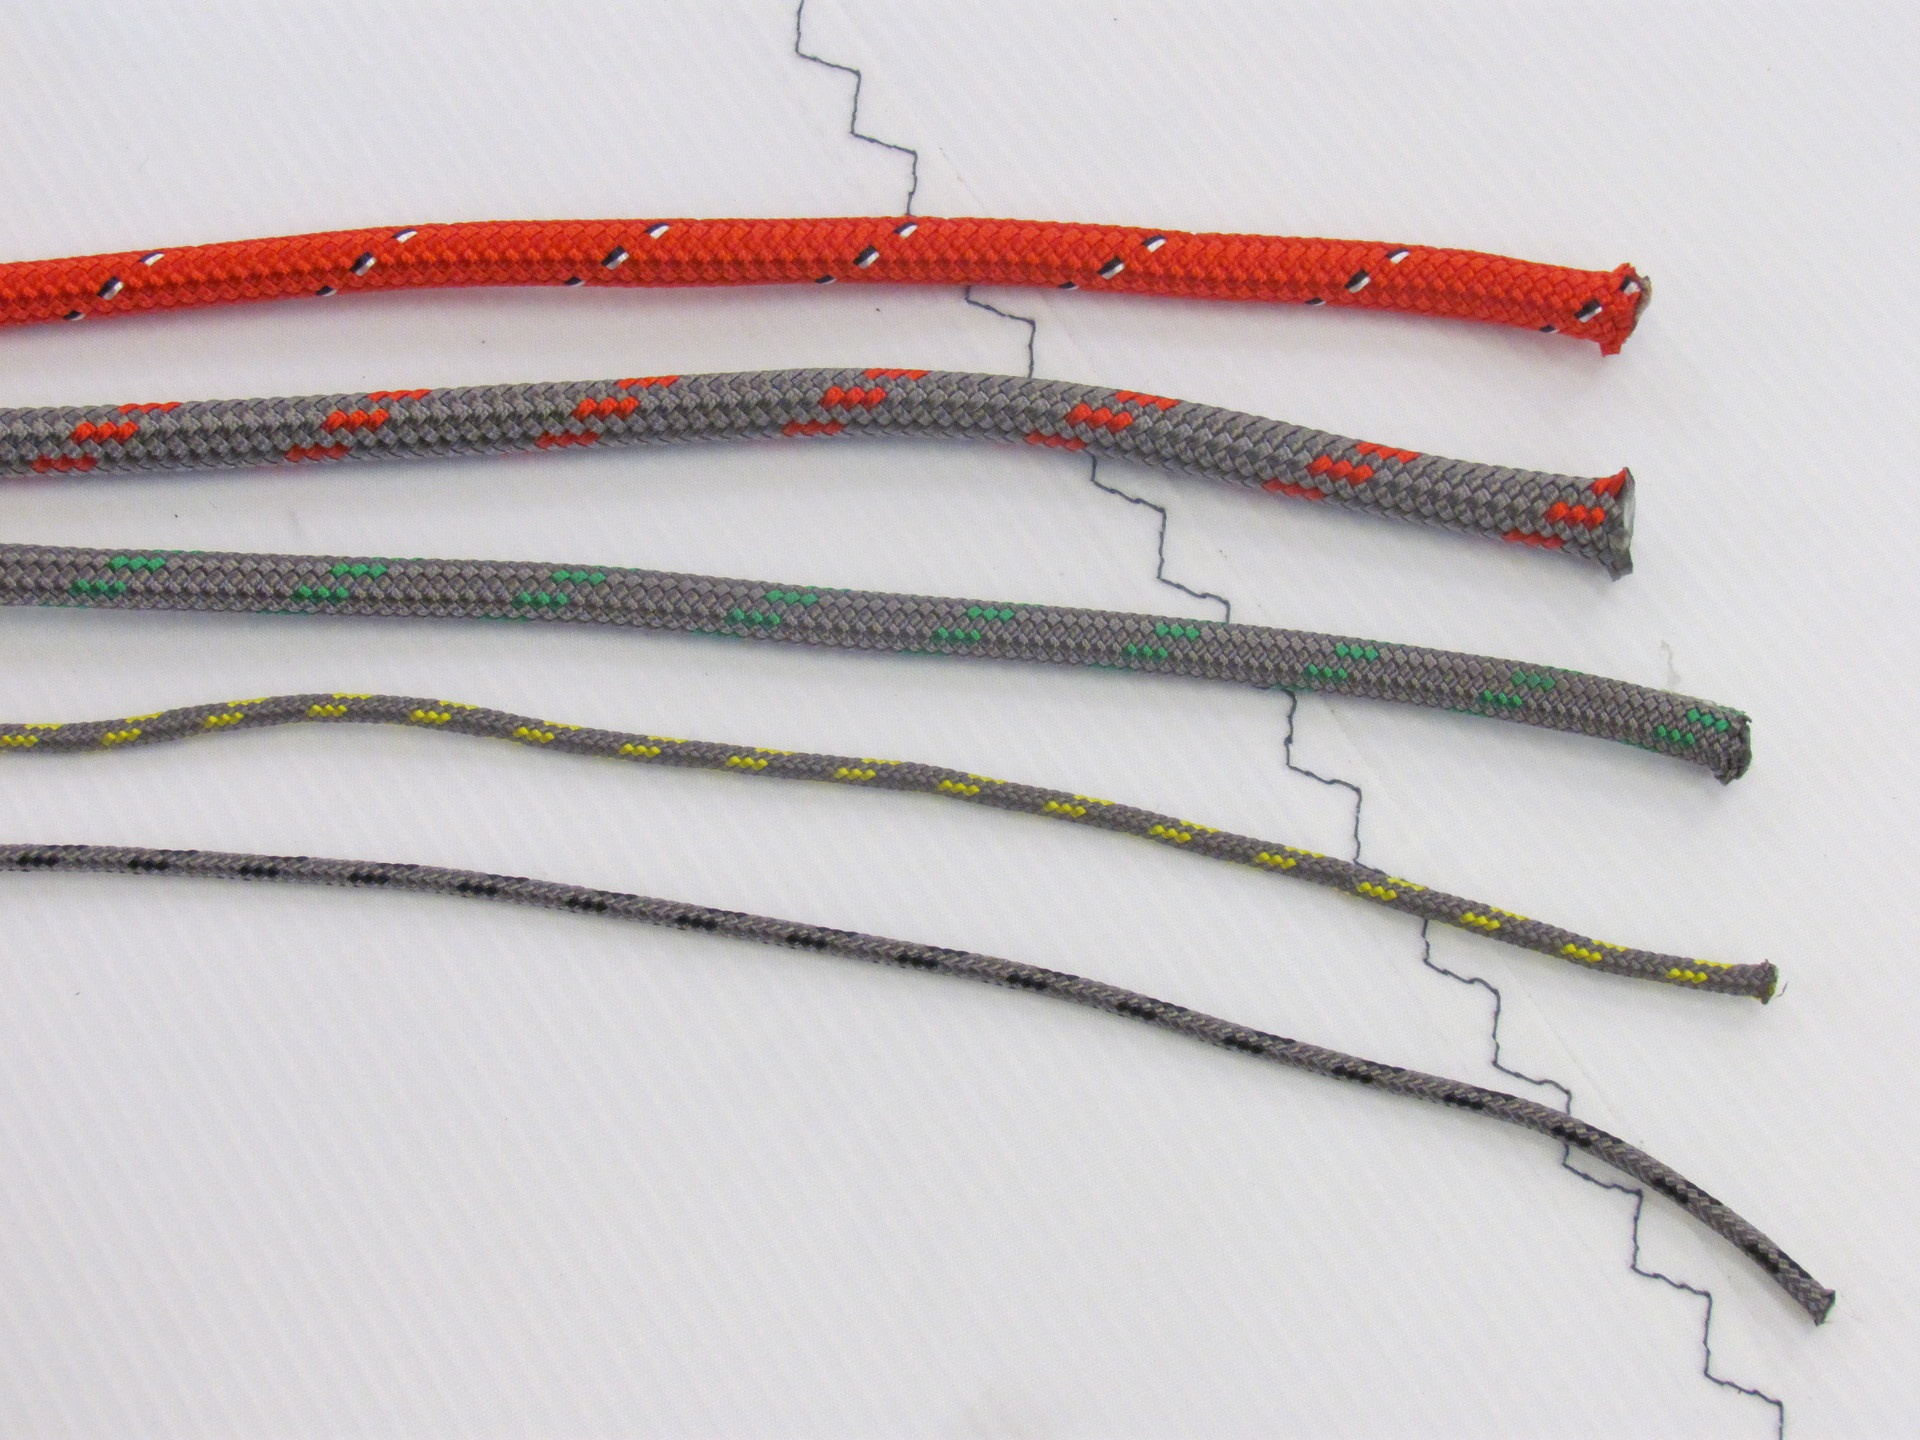 4.0MM Falcon Braid Polyester Cover Dyneema SK78 Core (B.L 704Kgs)